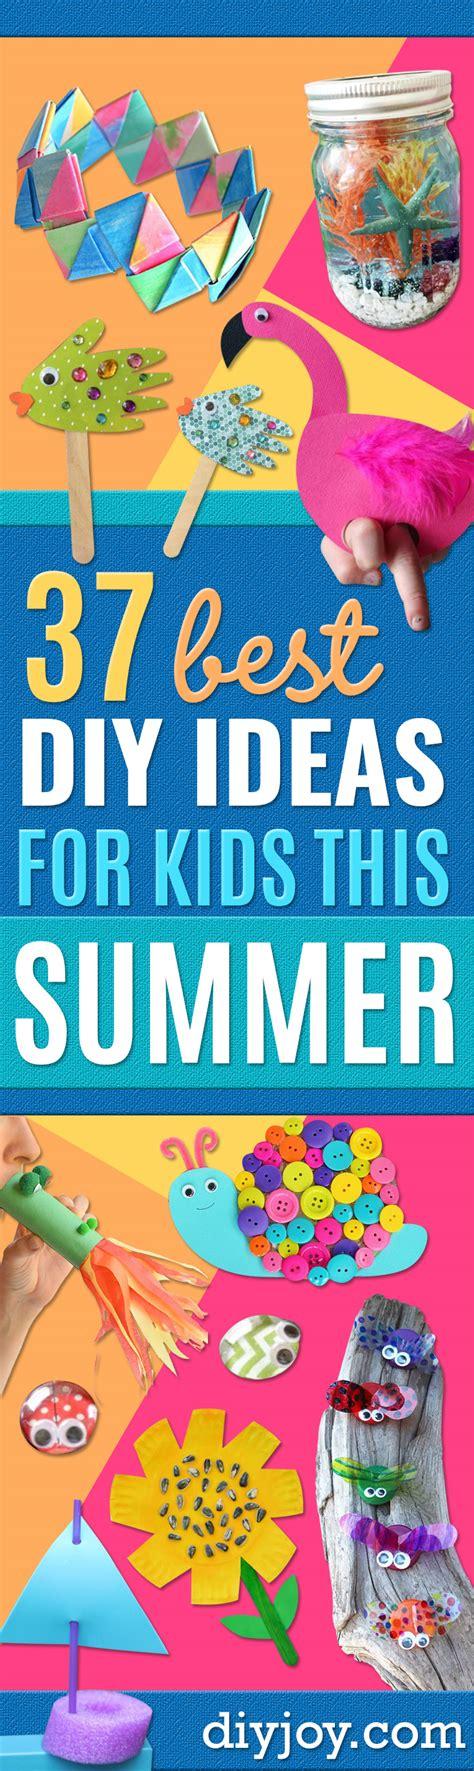 diy ideas  kids    summer